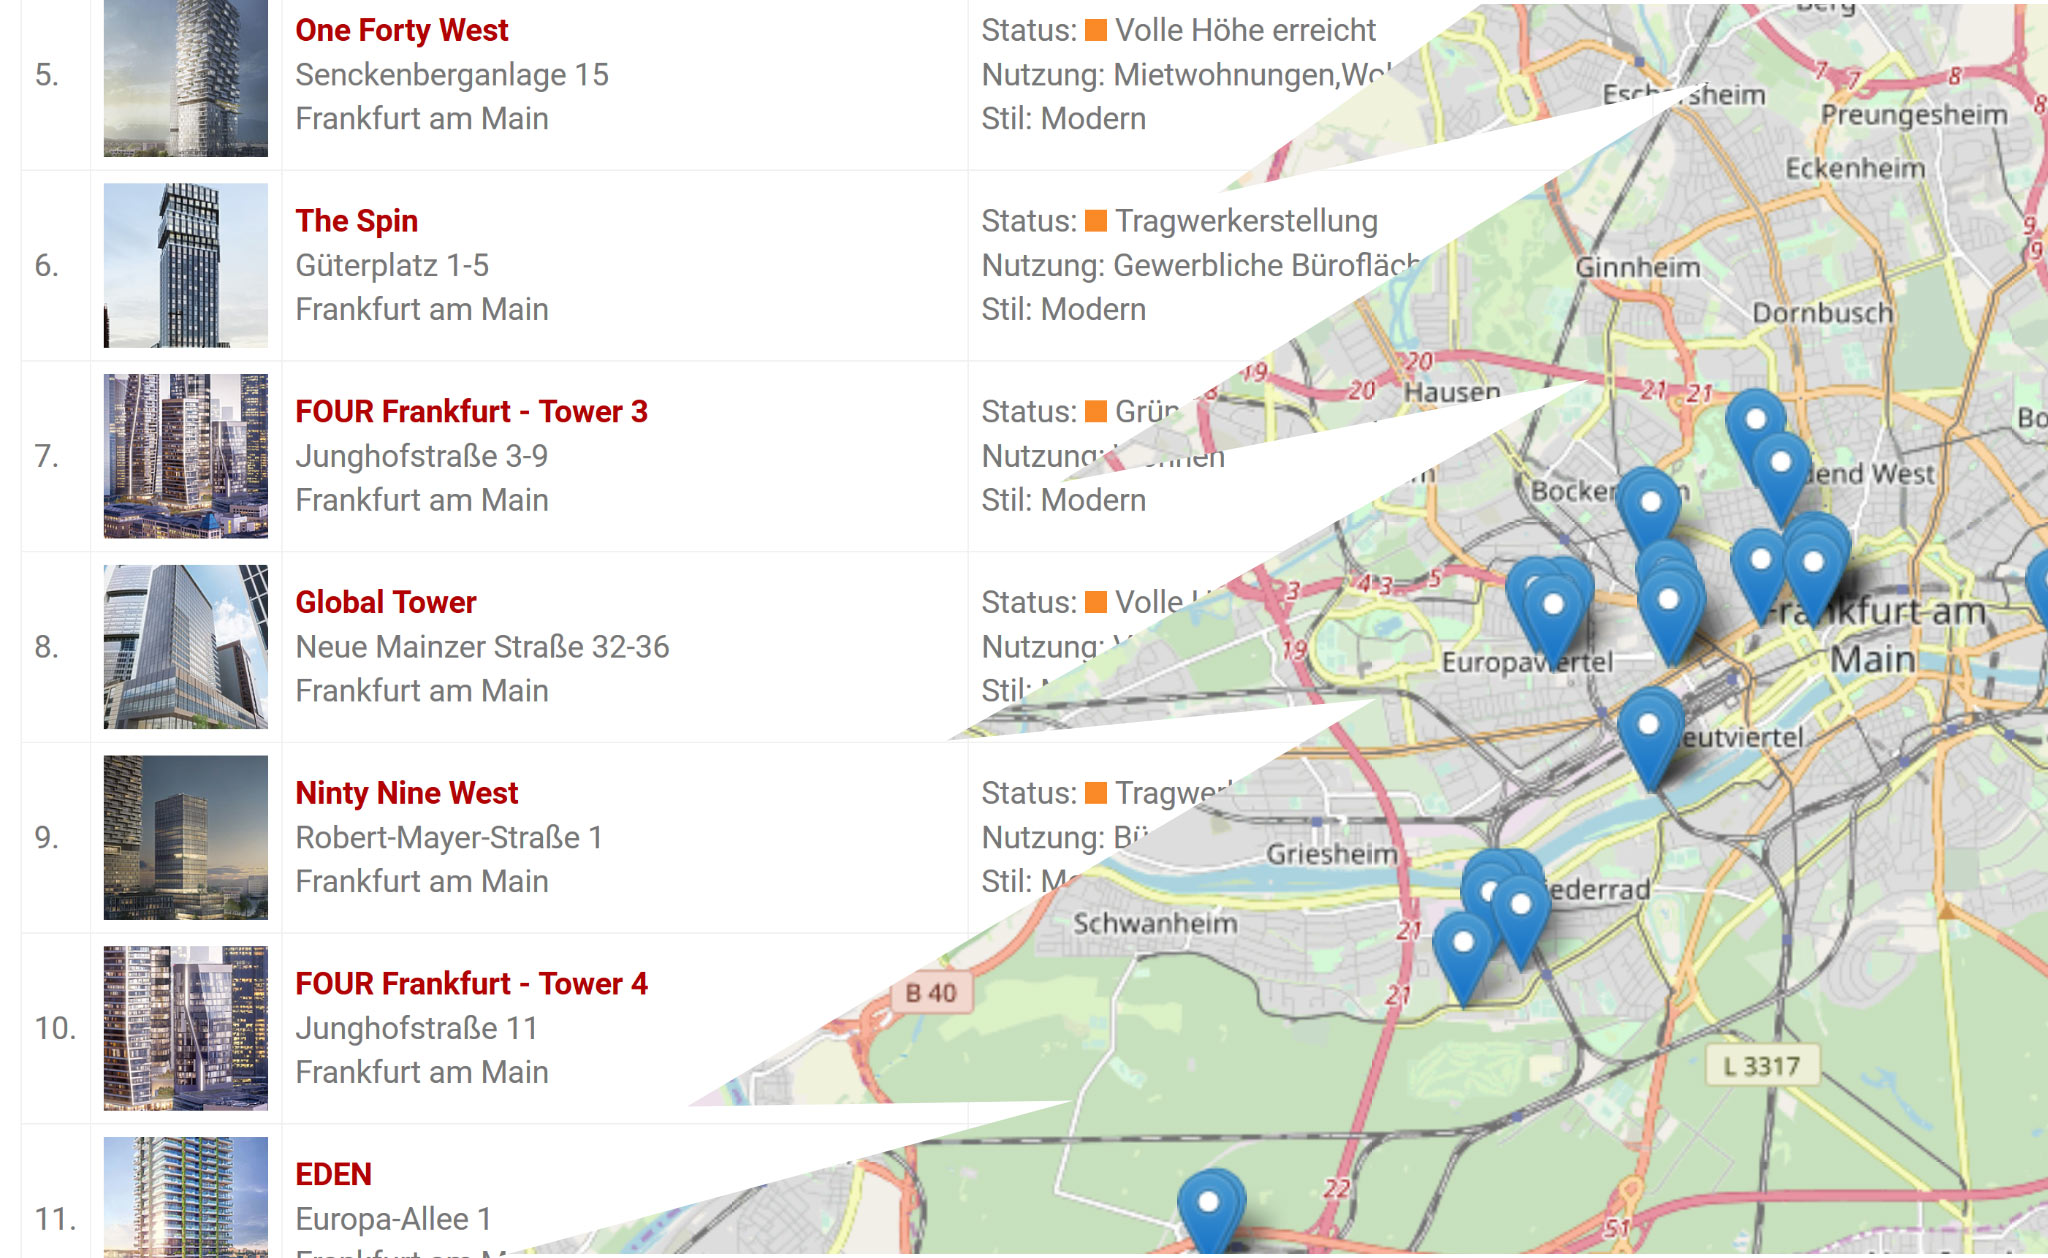 Hochhäuser Frankfurt - Liste und Karte - Hochhauskarte Frankfurt